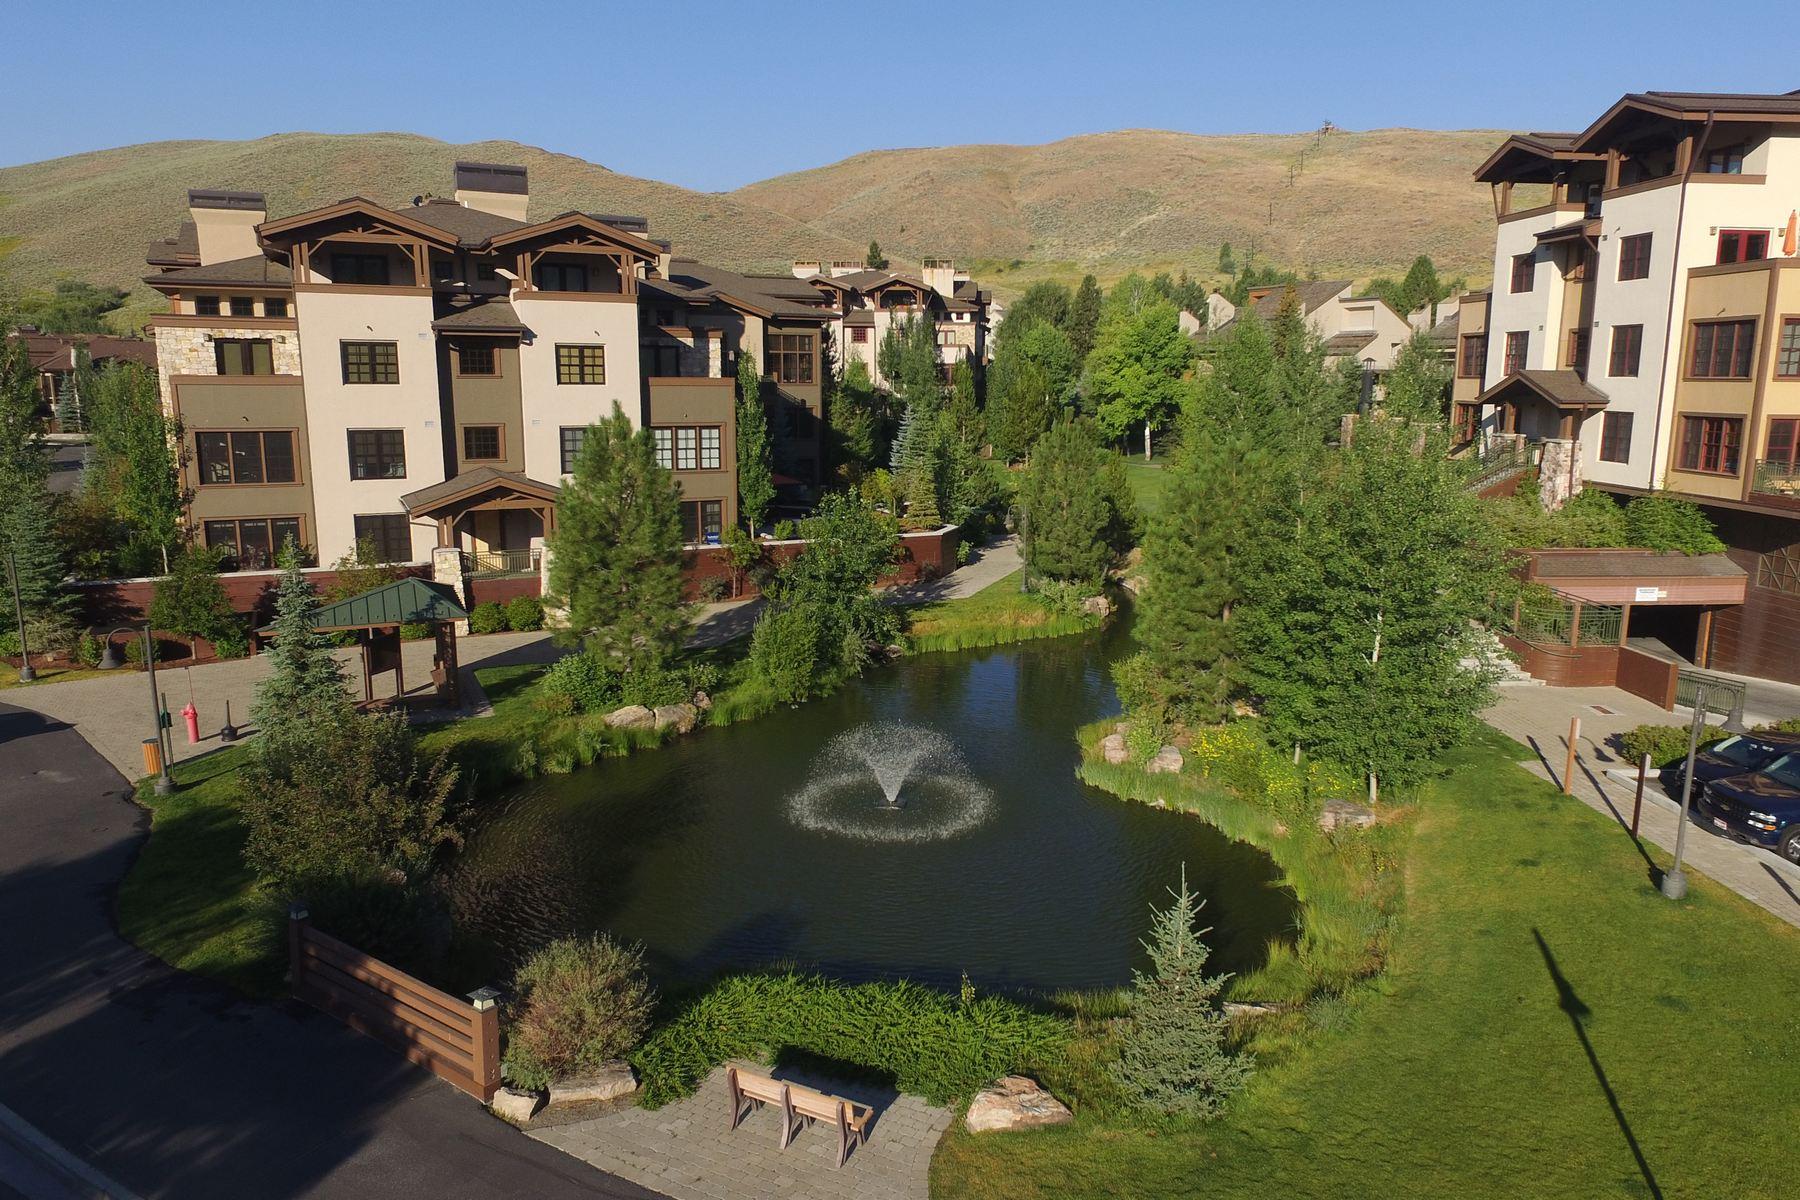 Condominium for Sale at Affordable Sutio 113 Angani Way #2058 Sun Valley, Idaho 83353 United States